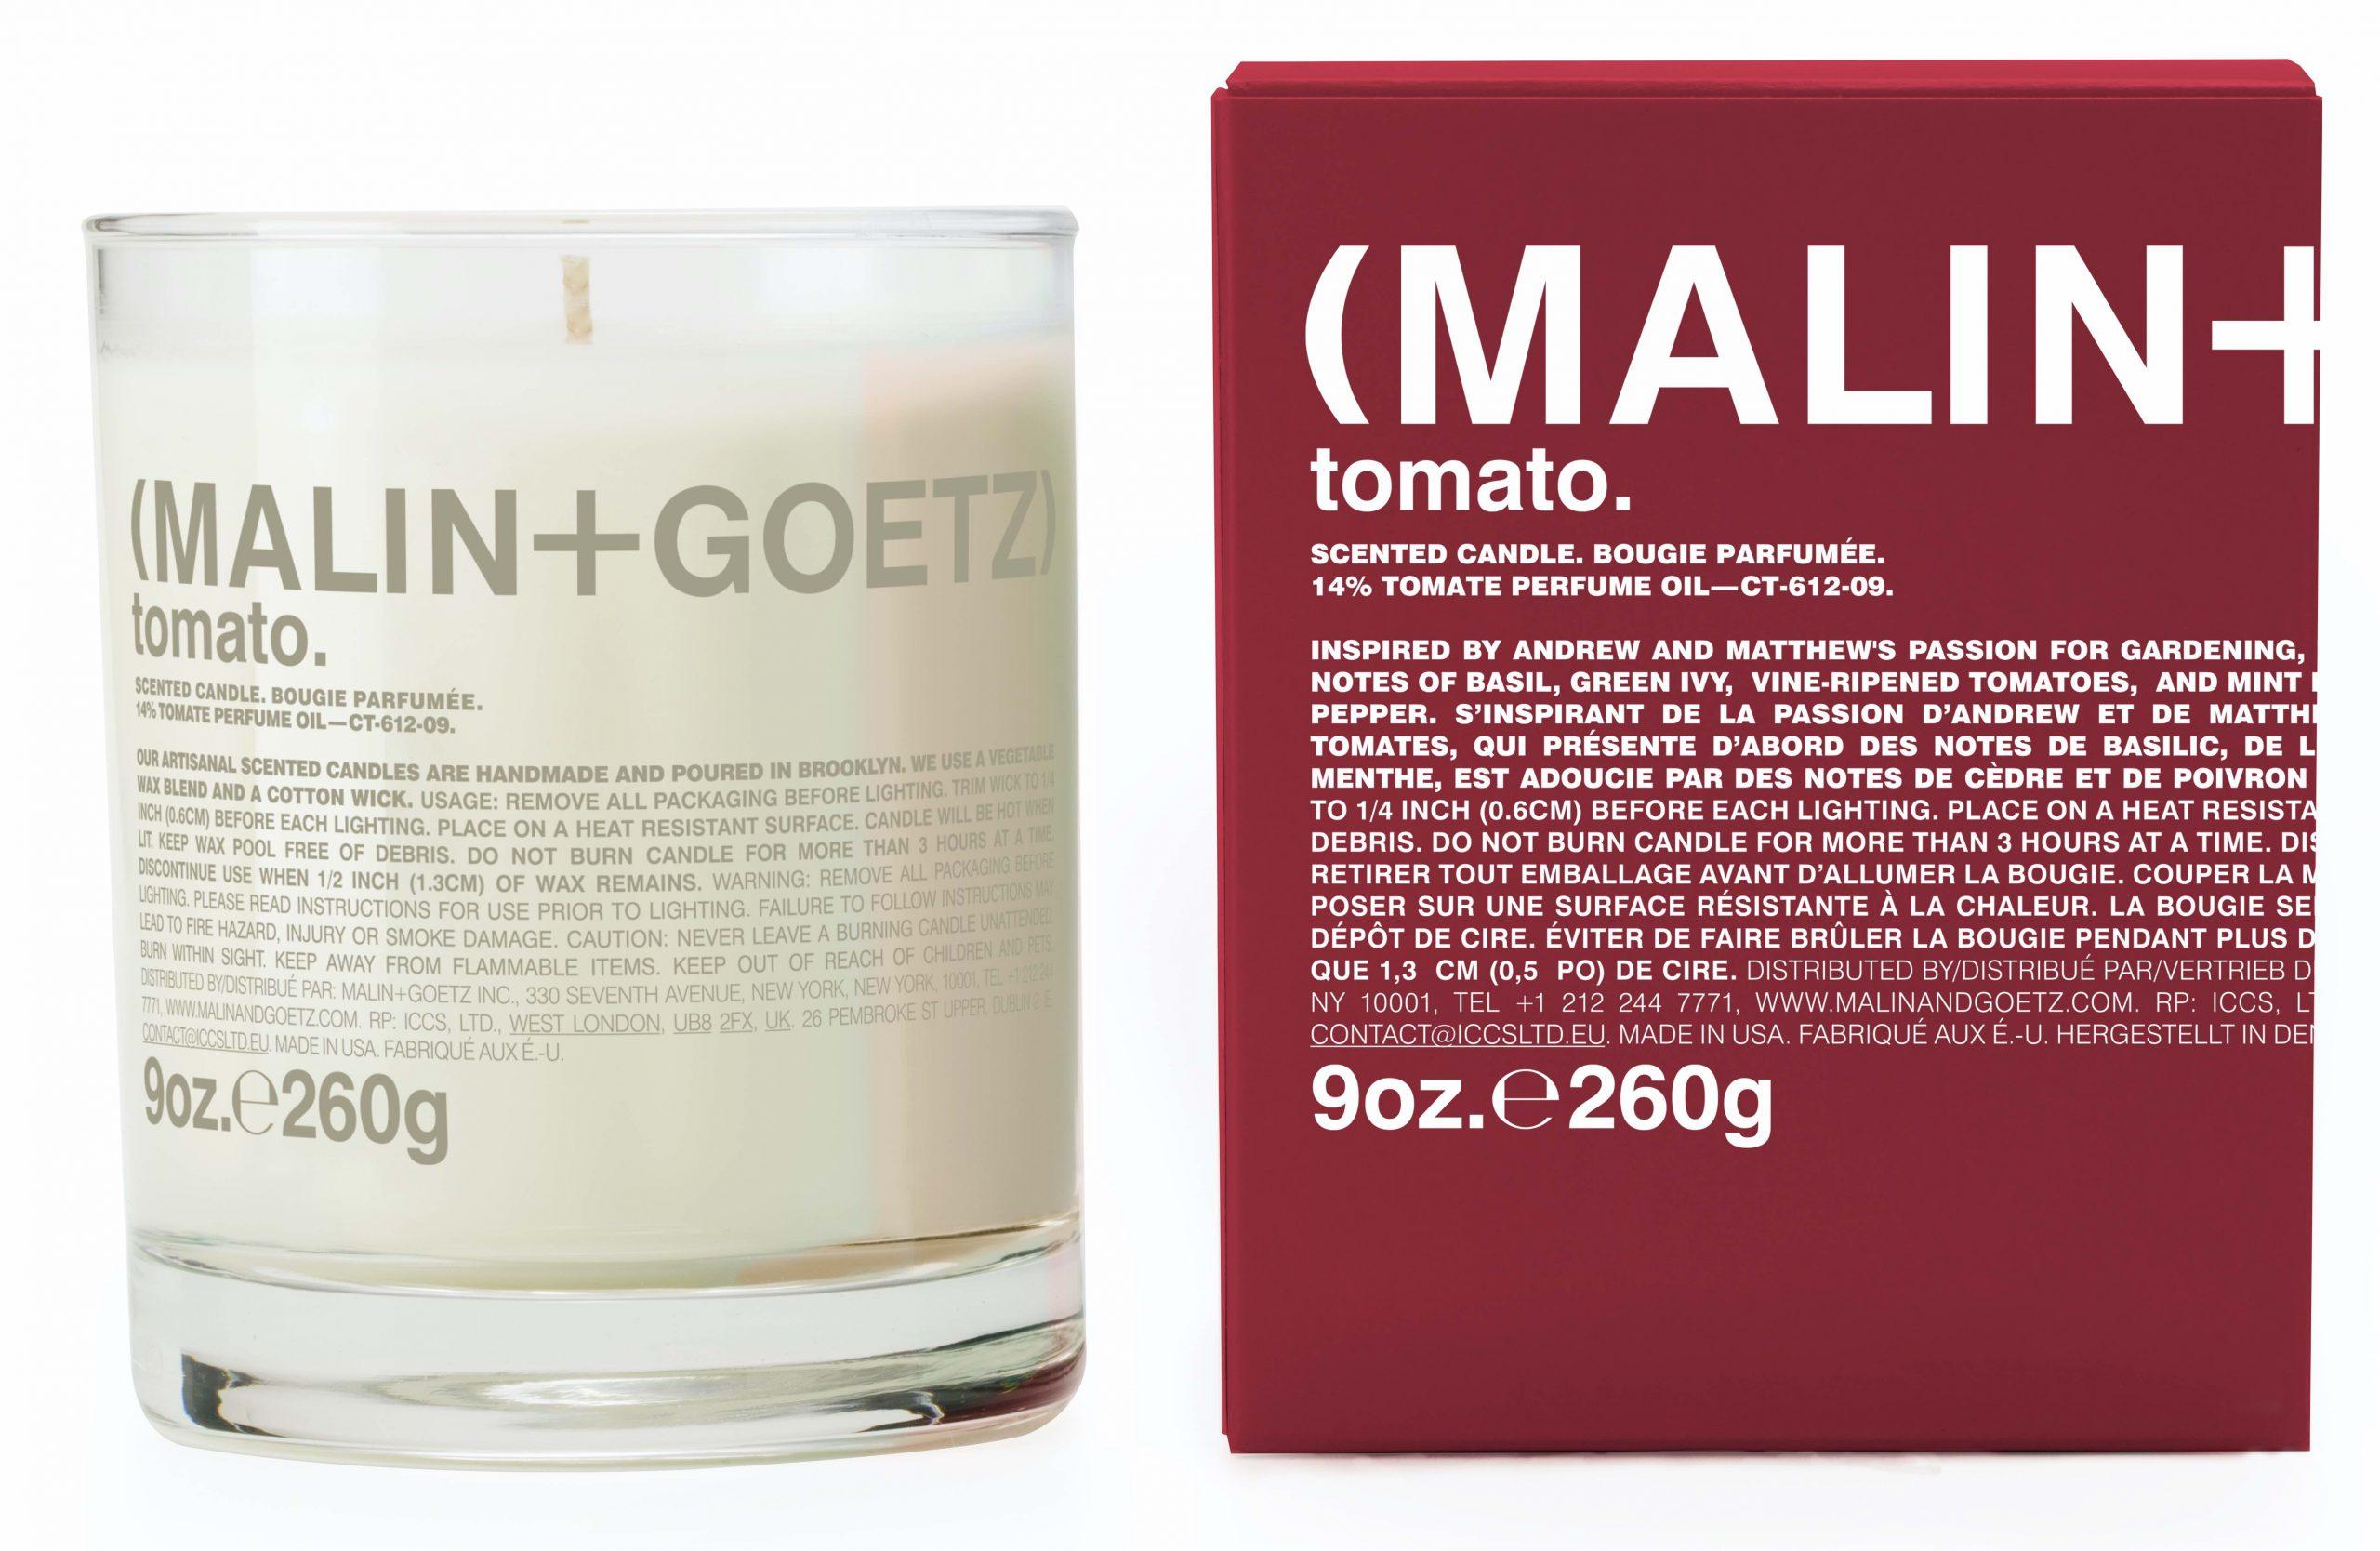 tomato garden candle malin + goetz